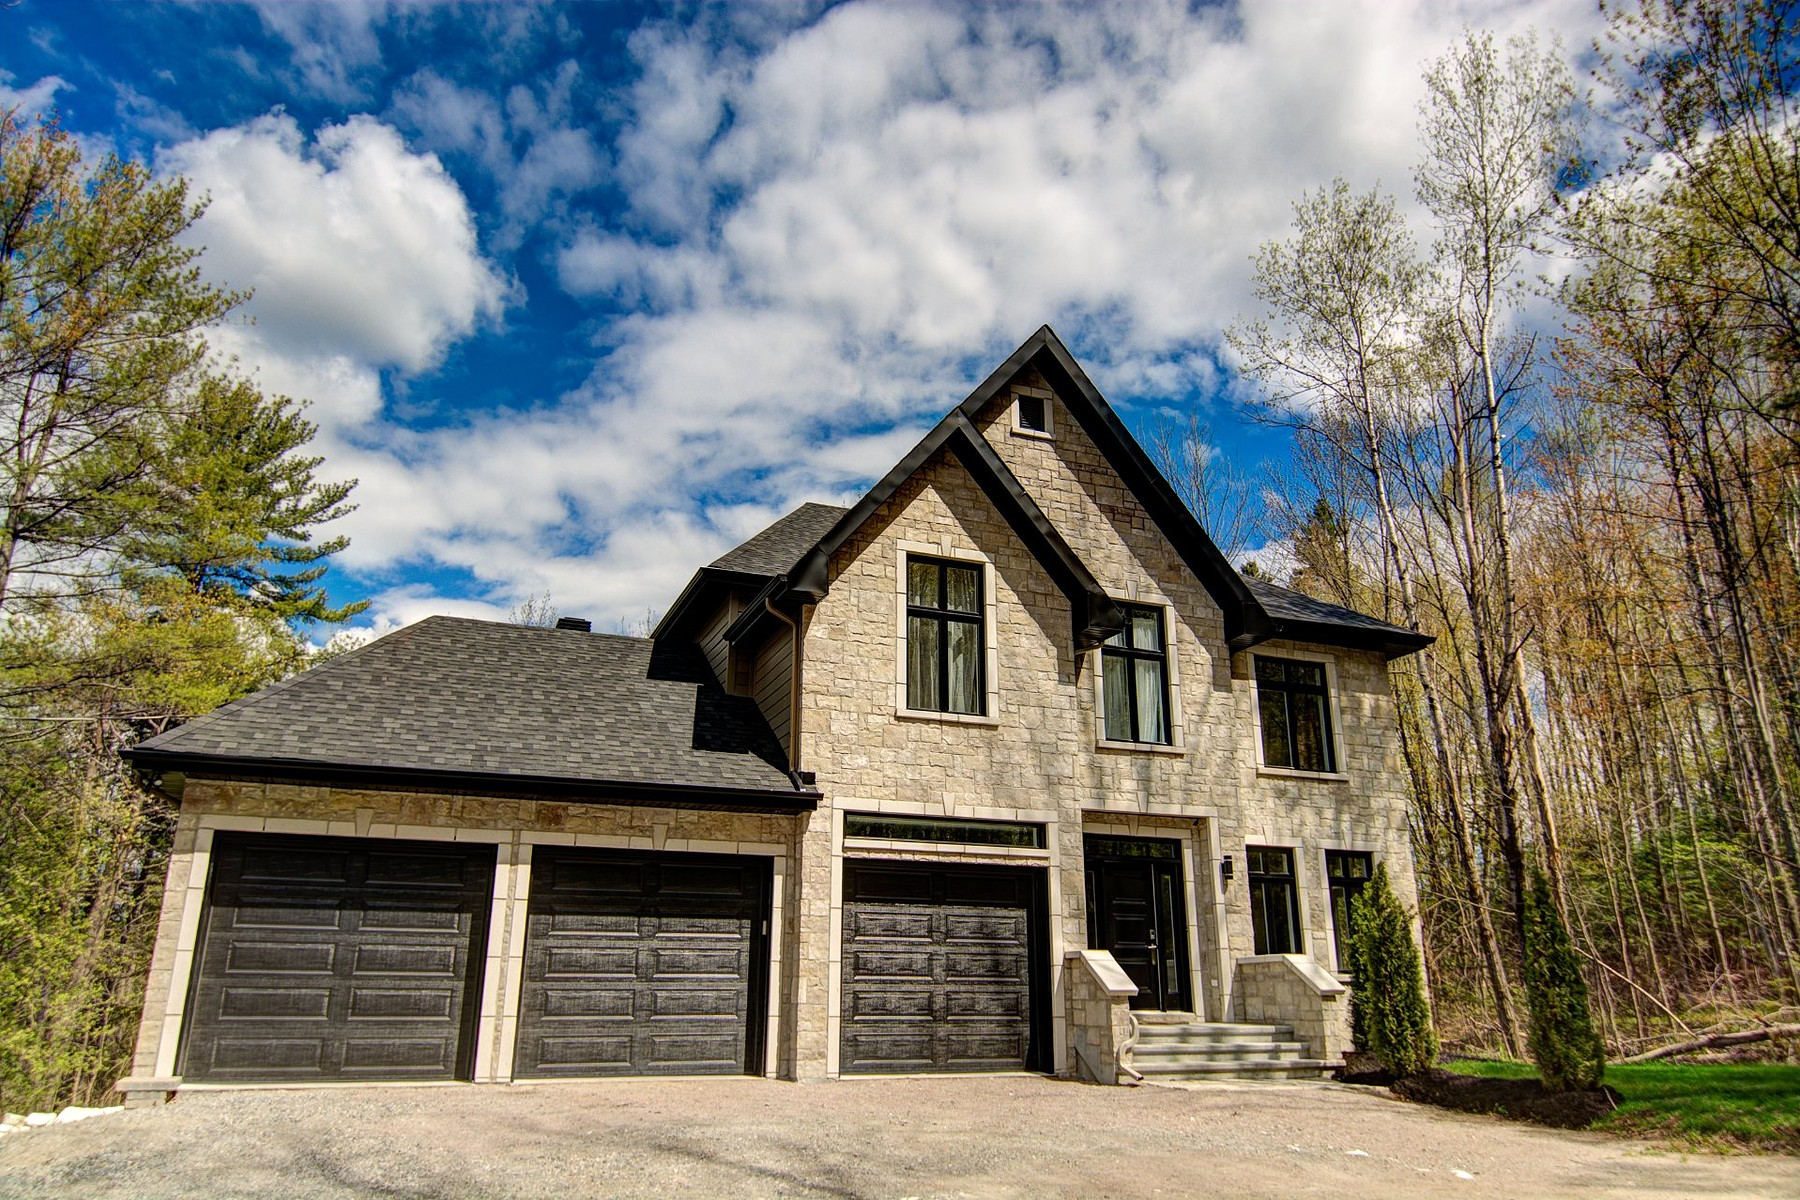 Einfamilienhaus für Verkauf beim Chelsea, Outaouais 41 Ch. St-Clément Chelsea, Quebec, J9B2L3 Kanada